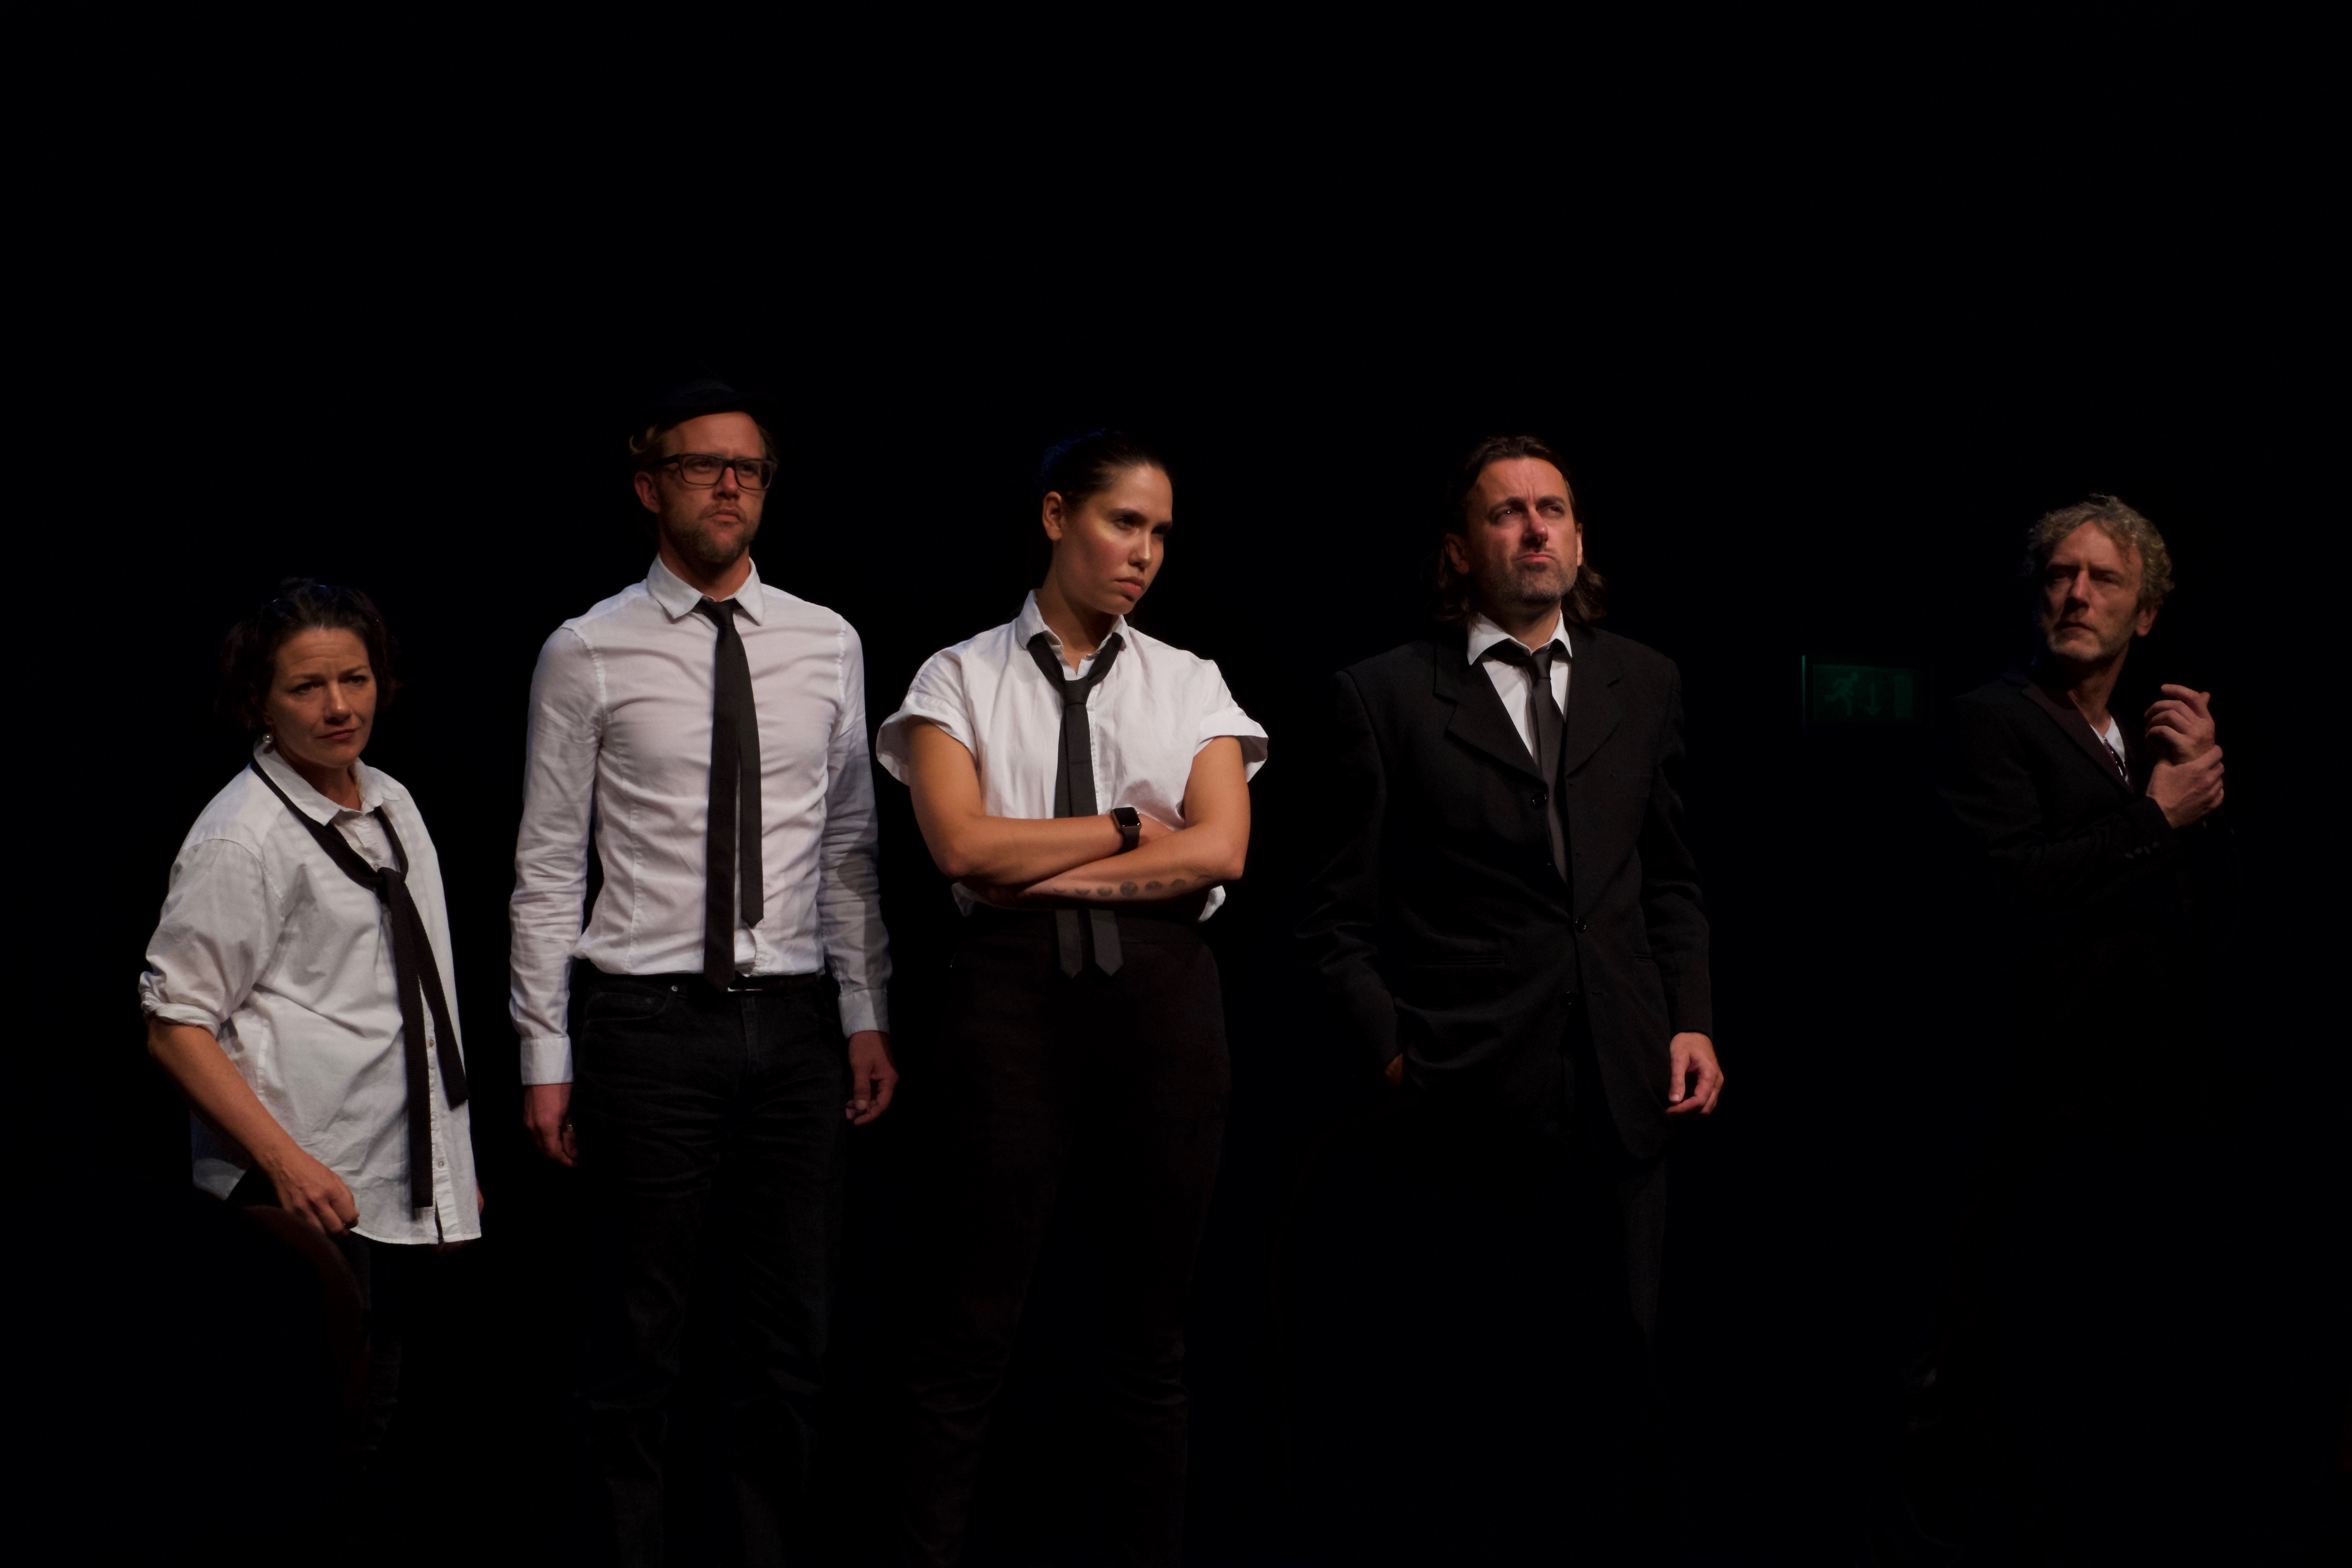 09 nov 21h show - tarantino